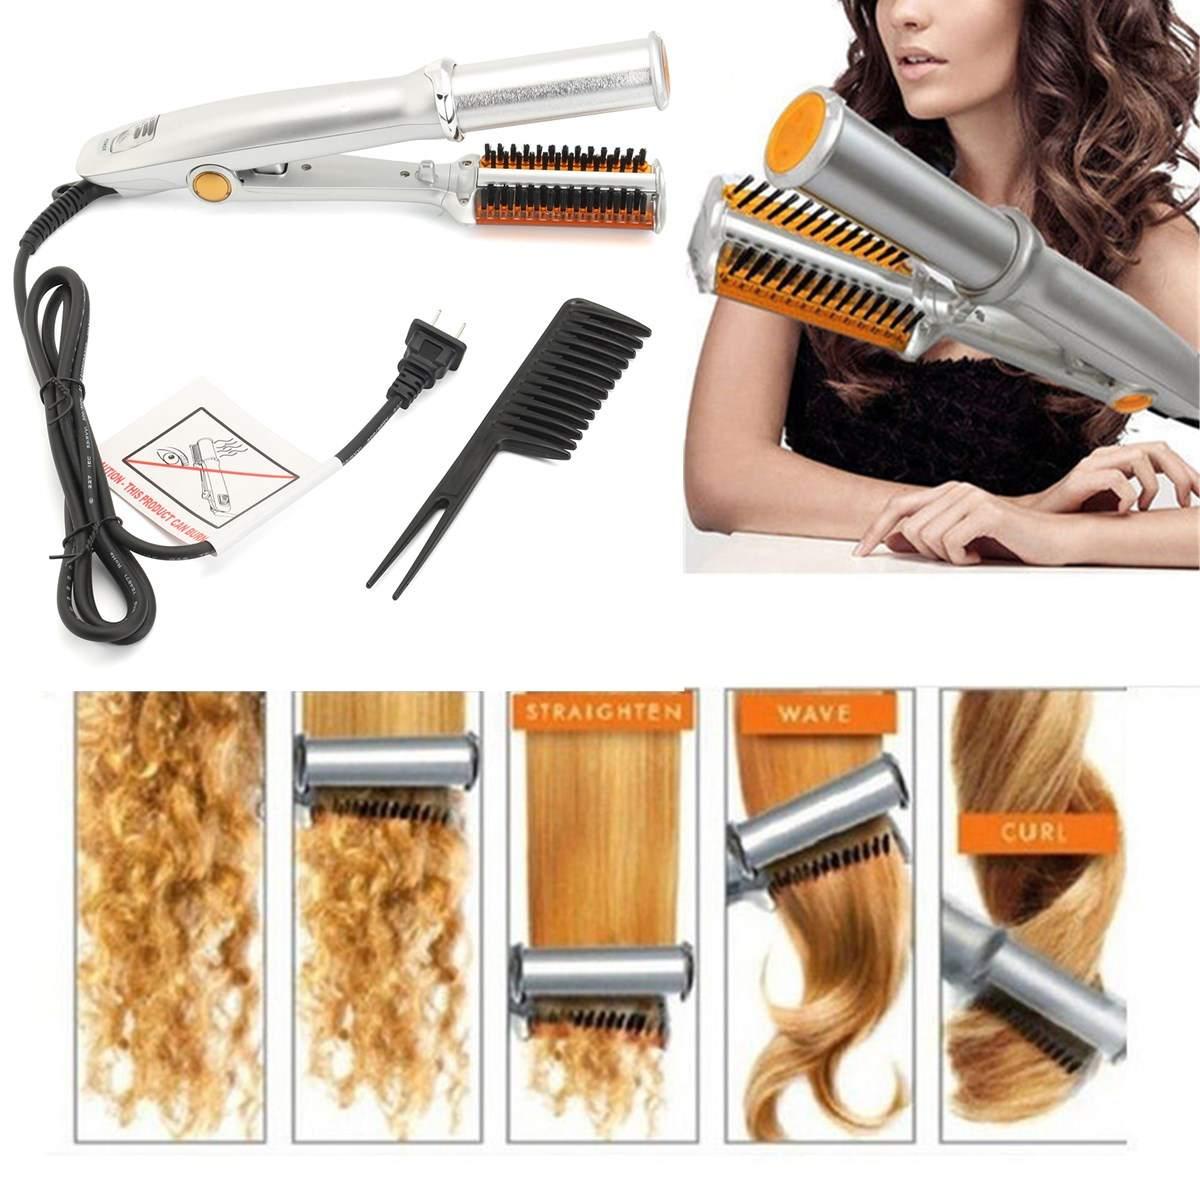 Digital Heating hair Brush Comb 2 in1 110-240V 29cm Pro Hair Straightener/Curling Ionic Styler Ceramic Hot Brush Flat